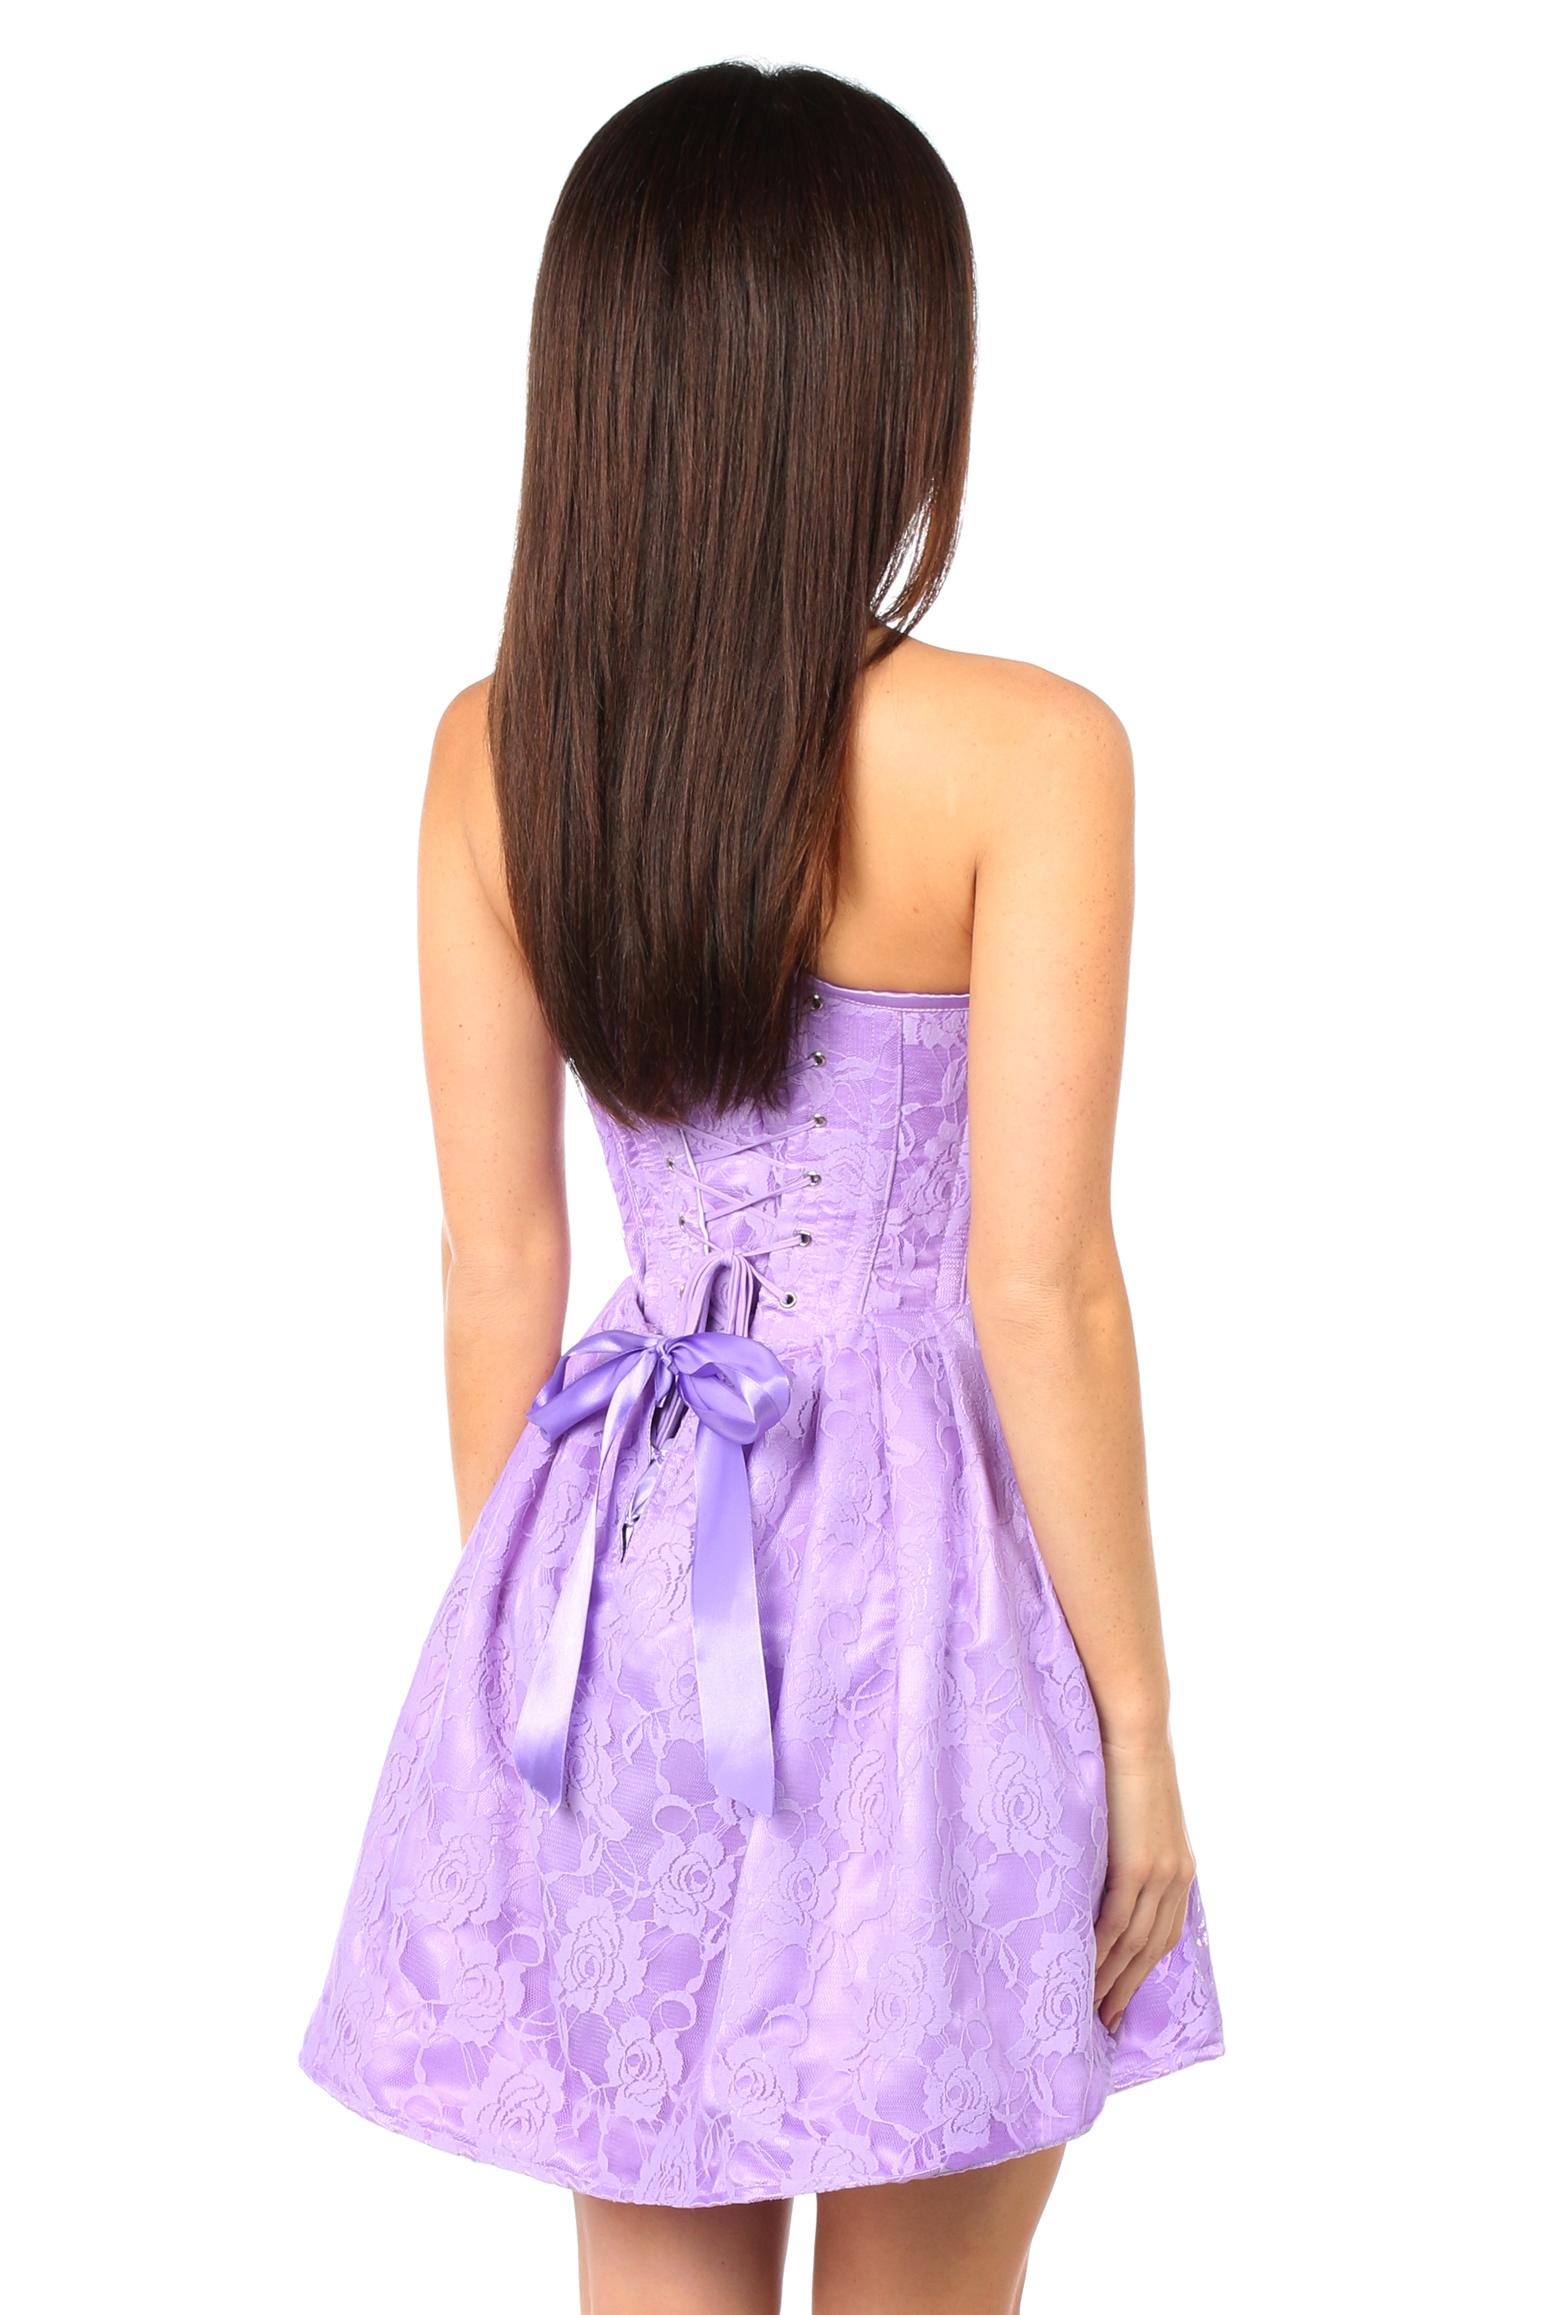 Top Drawer Steel Boned Lilac Lace Empire Waist Corset Dress DASTD-597